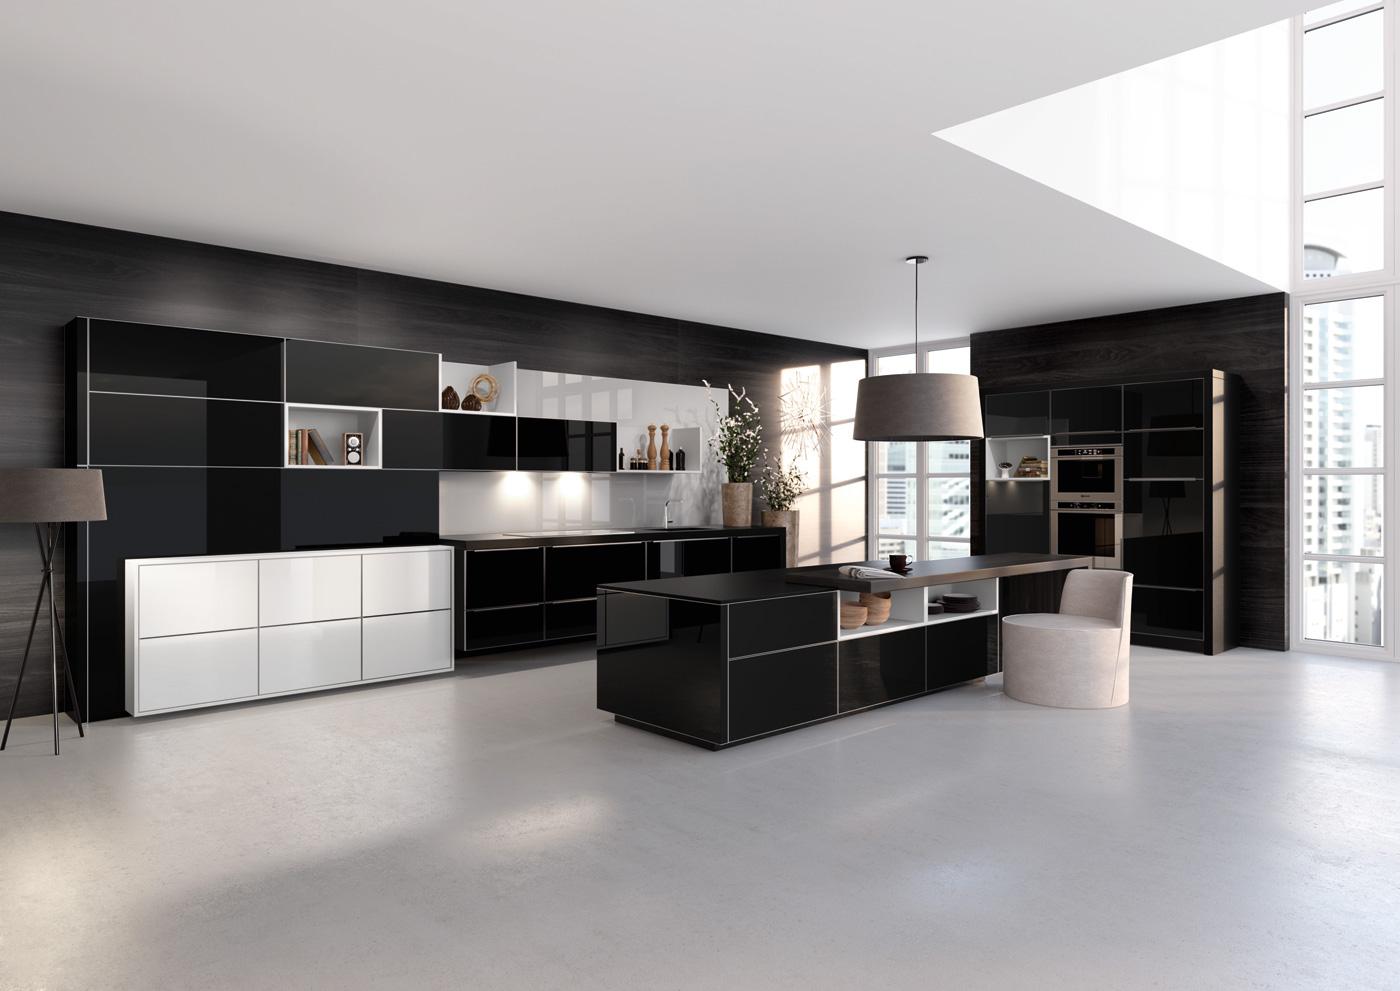 Alno Küchen Alno Küchen Alno Küchen Alno Küchen